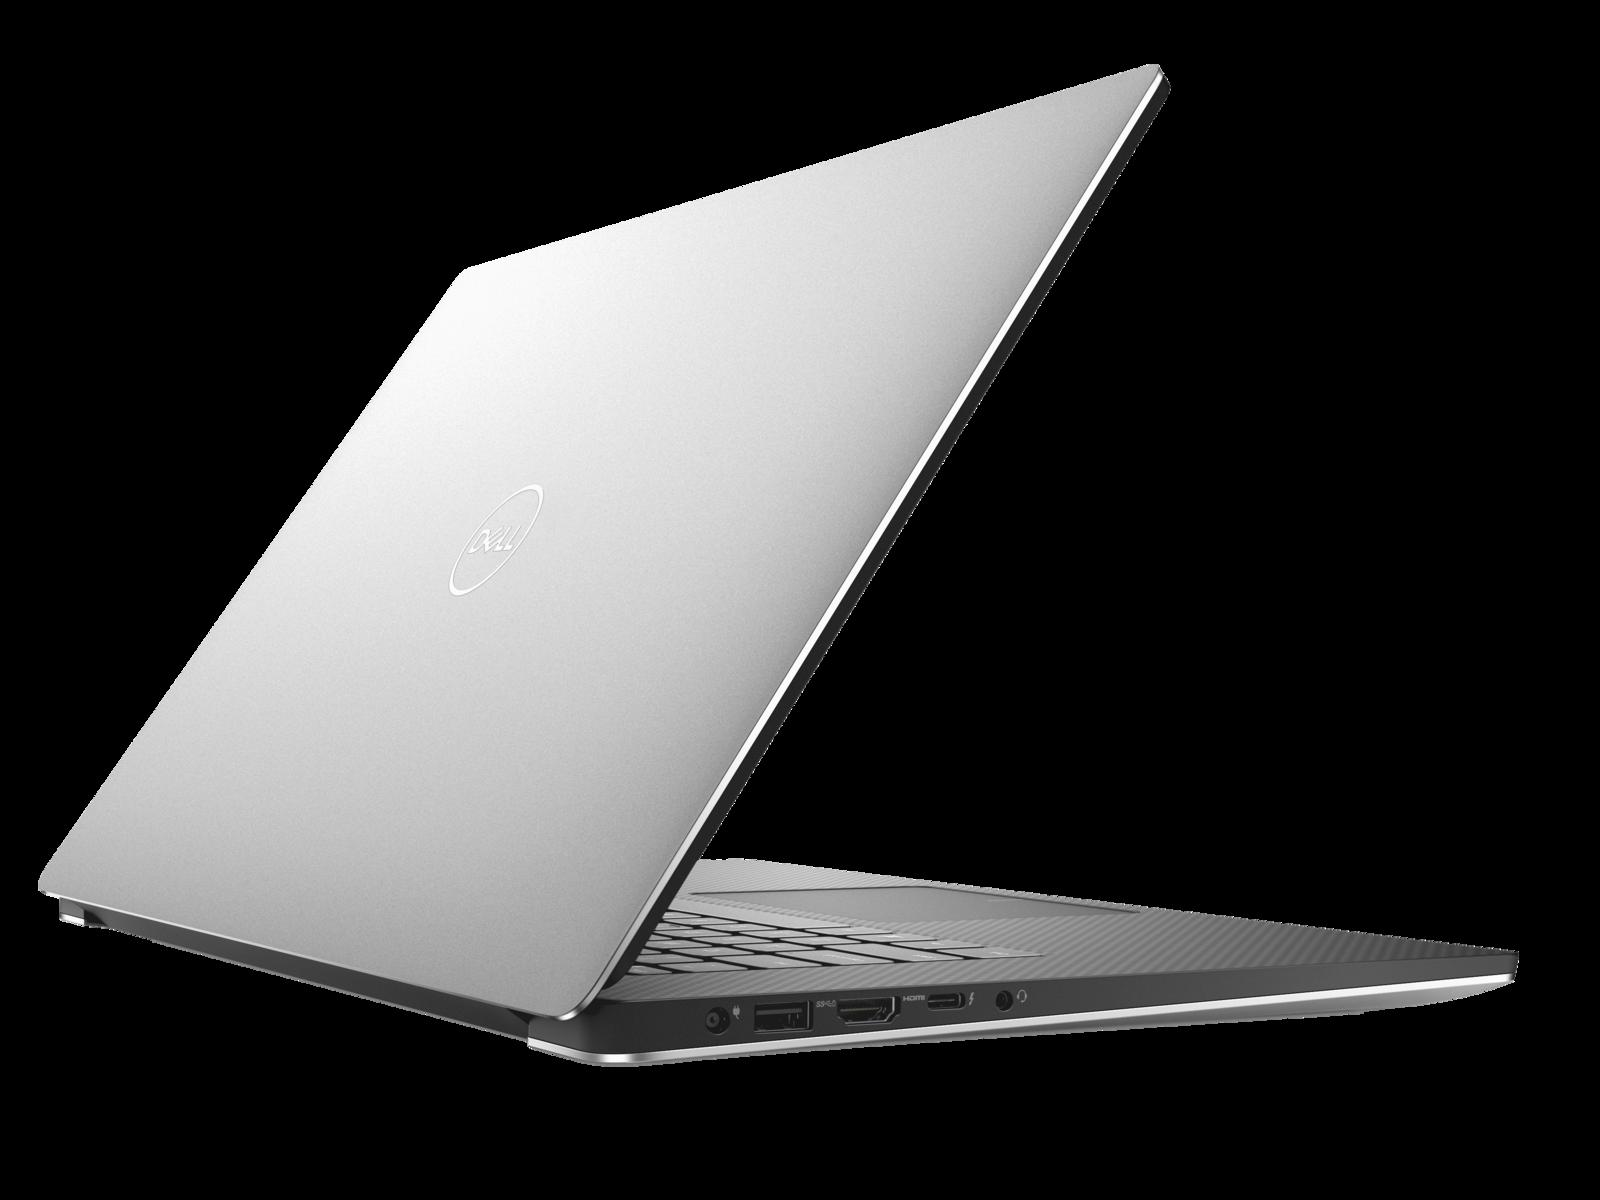 Dell XPS 15 9570 Core i5-8300H | Core i7-8750H | Core i9 Windows 10